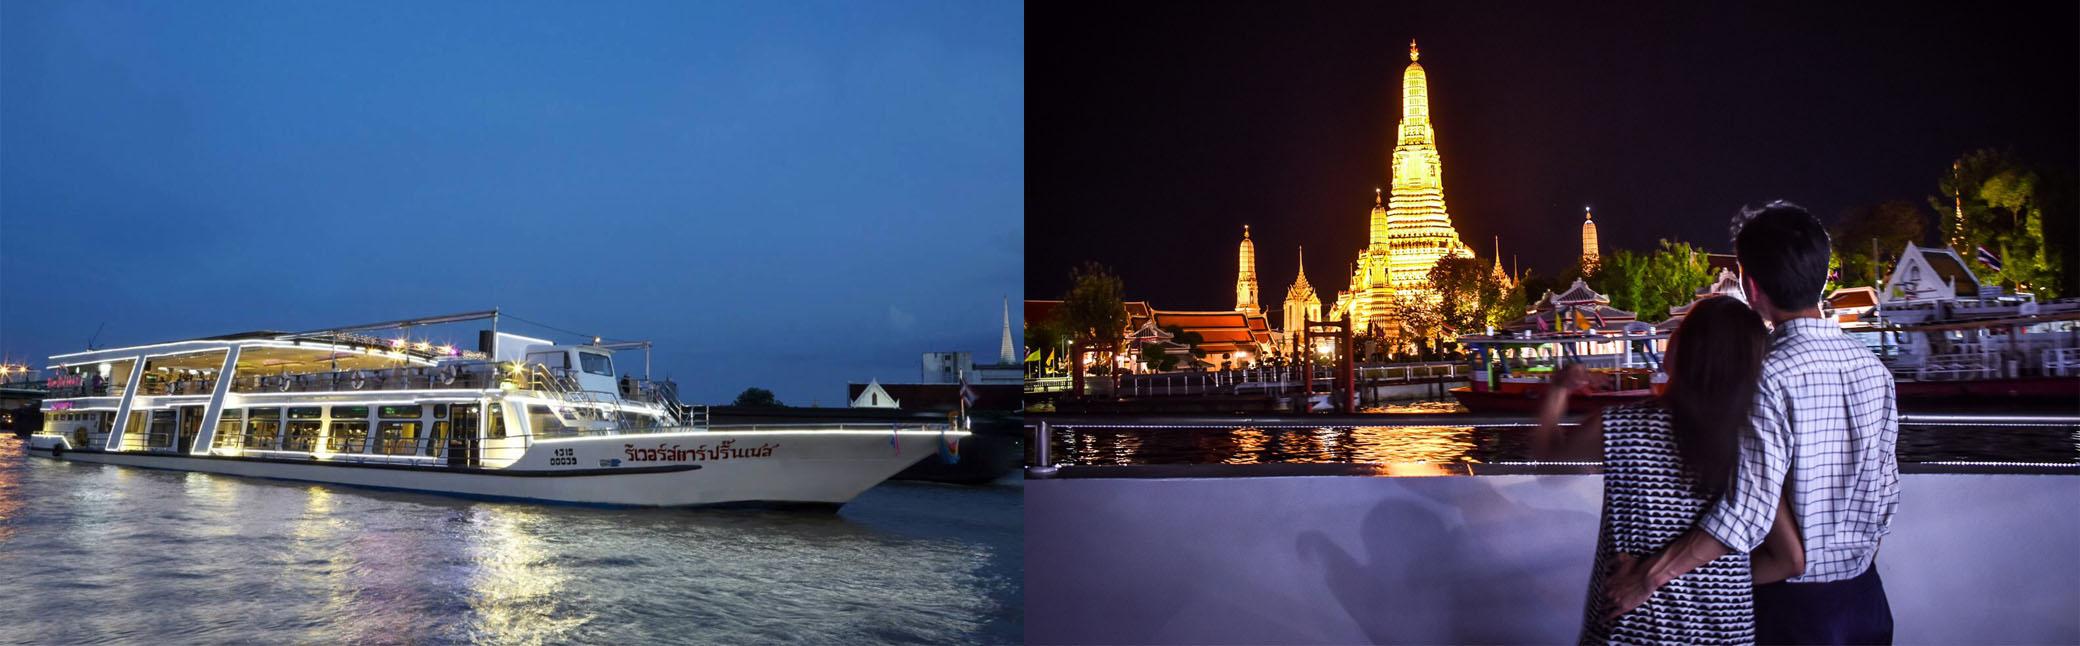 River Star Princess / Dinner Cruise ล่องเรือแม่น้ำเจ้าพระยา ริเวอร์สตาร์ปริ้นเซส